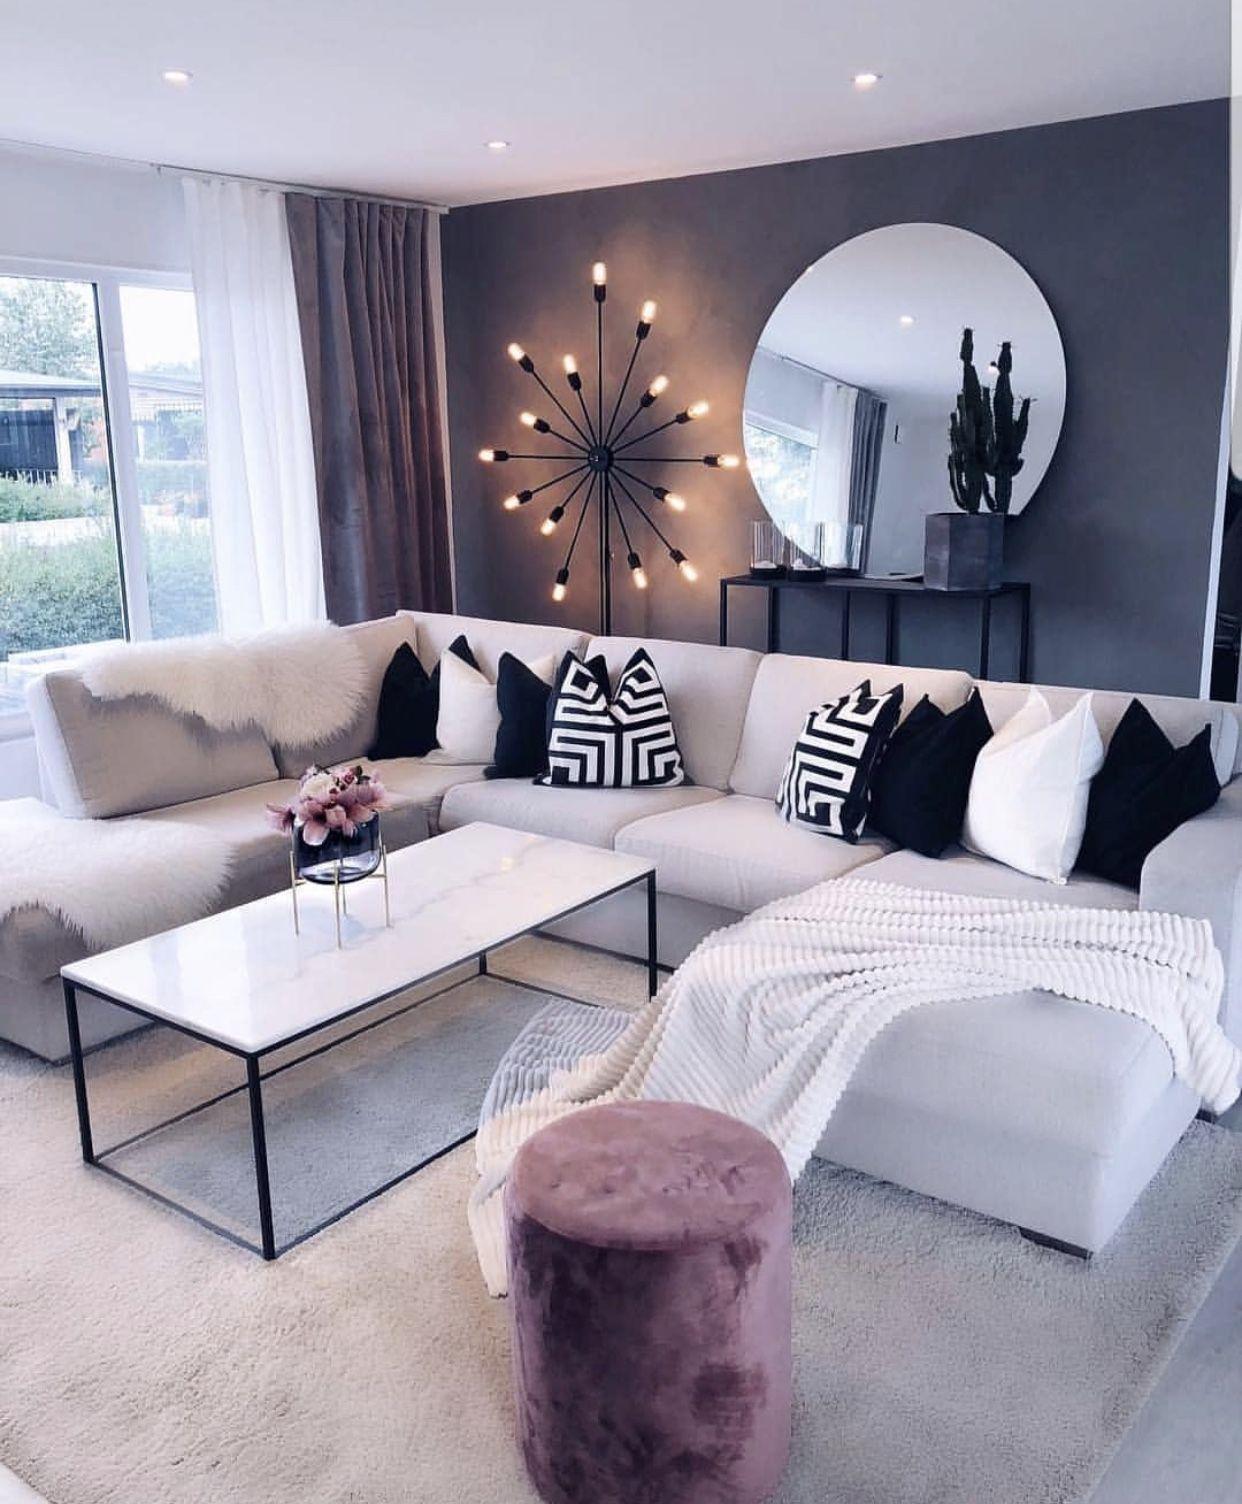 21 Antique Living Room Black Pink To Make Luxurious Look Pink Living Room Luxury Living Room Home Pink and black living room ideas